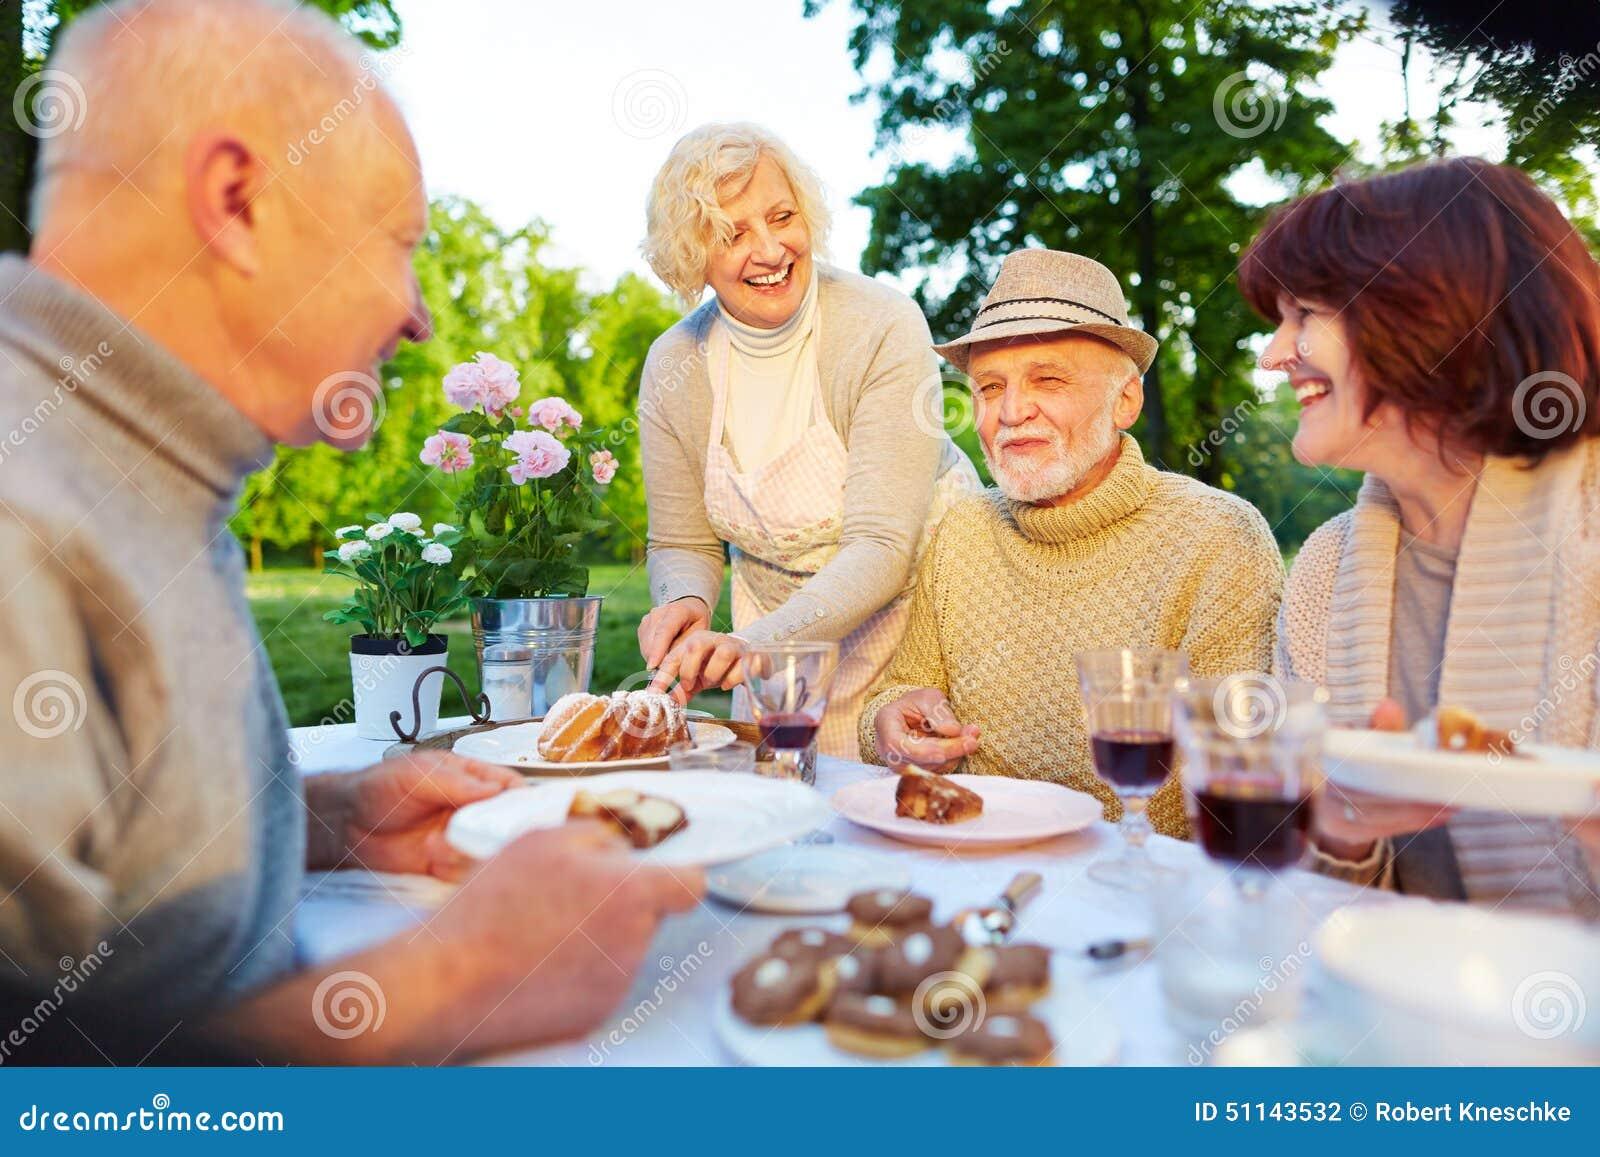 happy seniors at birthday party with cake stock photo